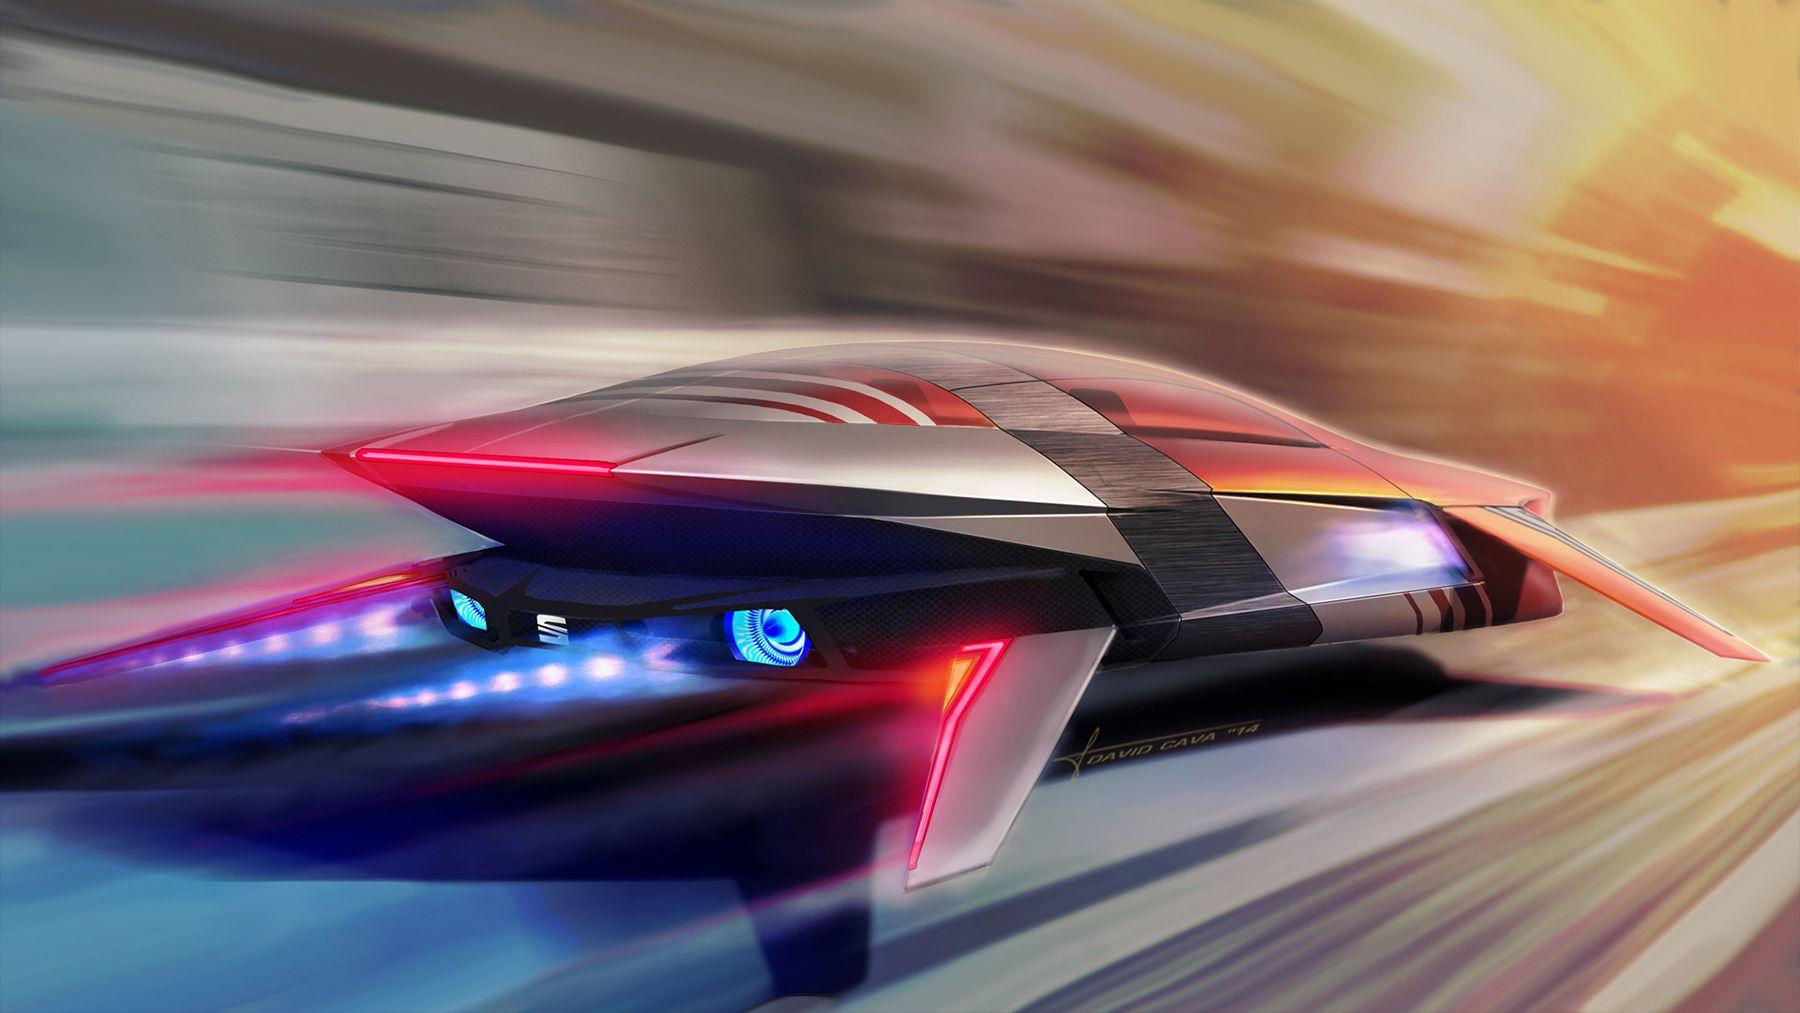 concept ships: SEAT MLx (Magnetic Levitation Xshape) by David Cava